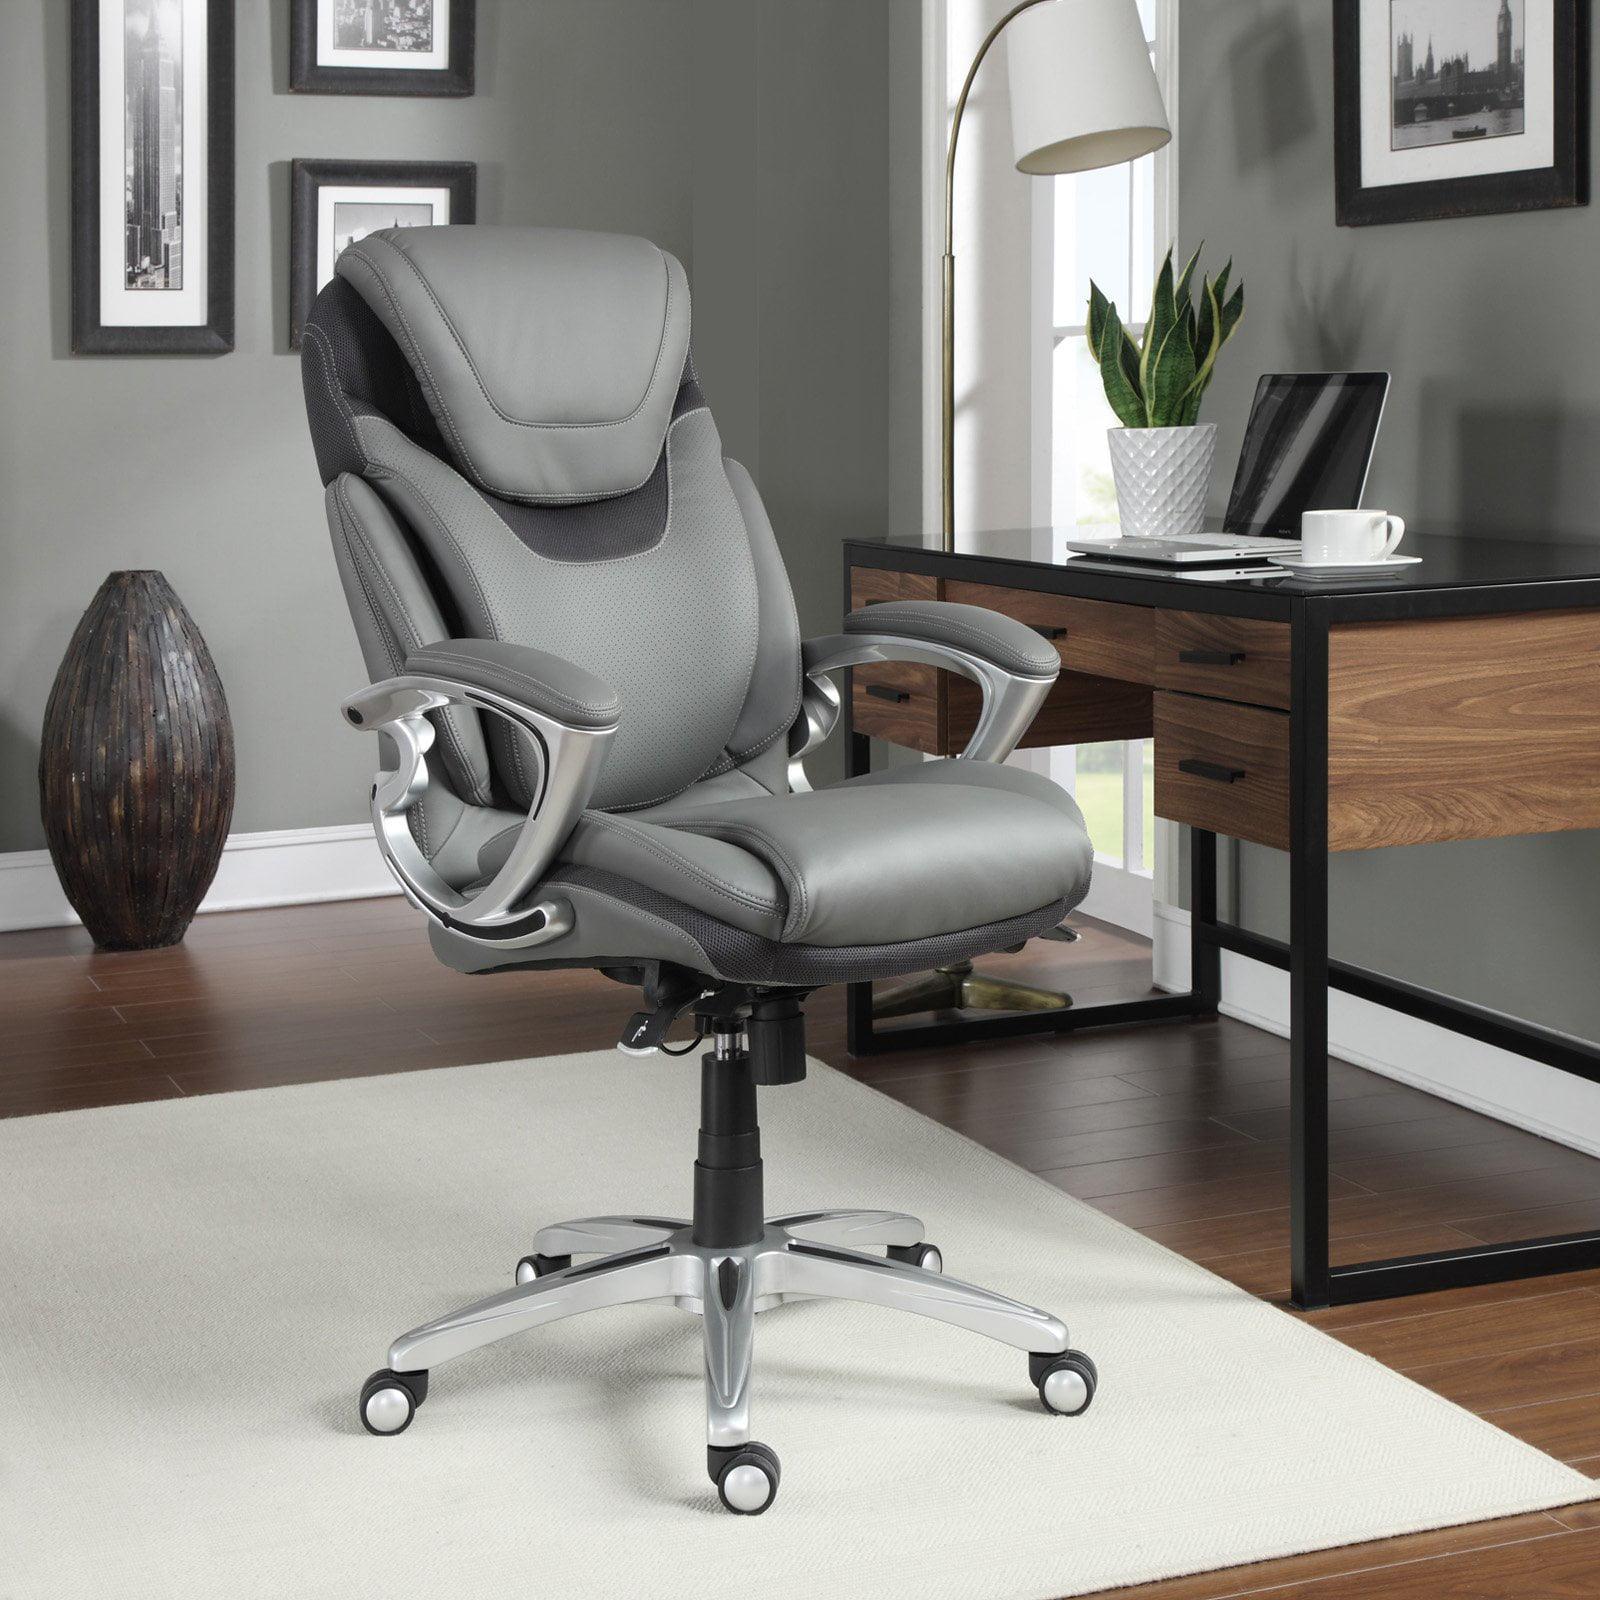 Serta AIR Health & Wellness Leather Executive Office Chair, Light